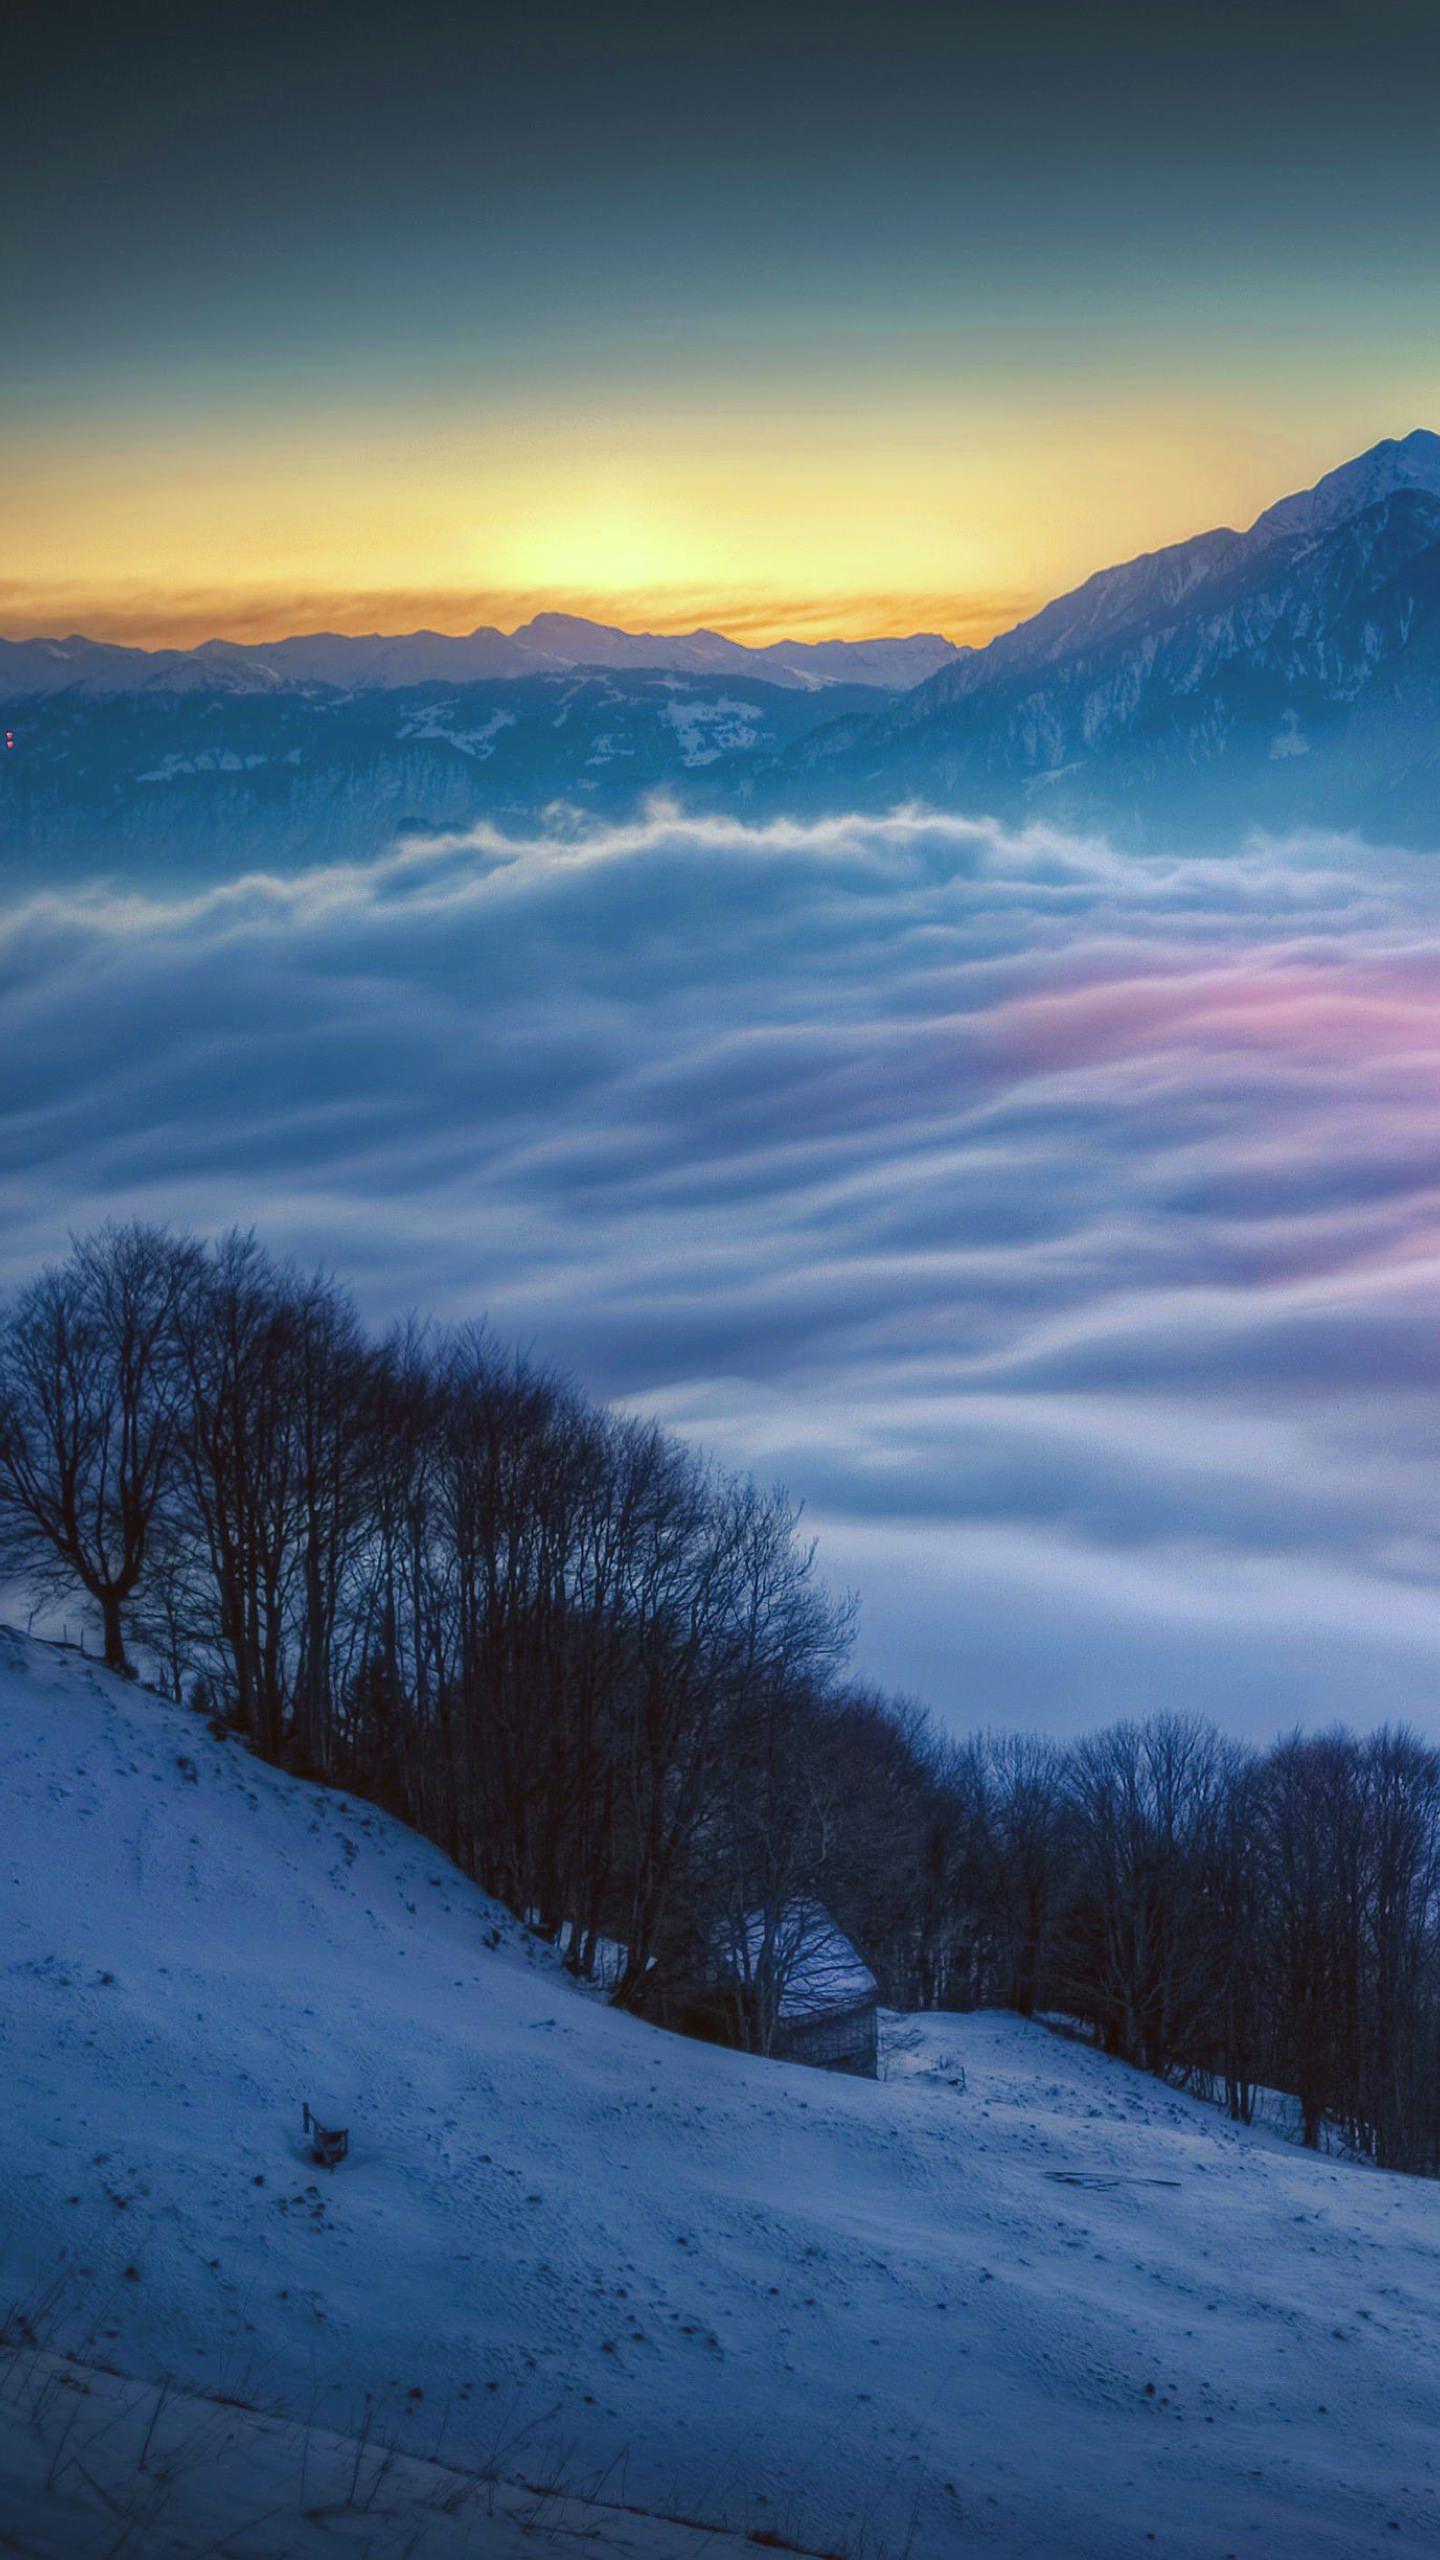 Unduh 4400 Koleksi Wallpaper Pemandangan Gunung HD Paling Keren